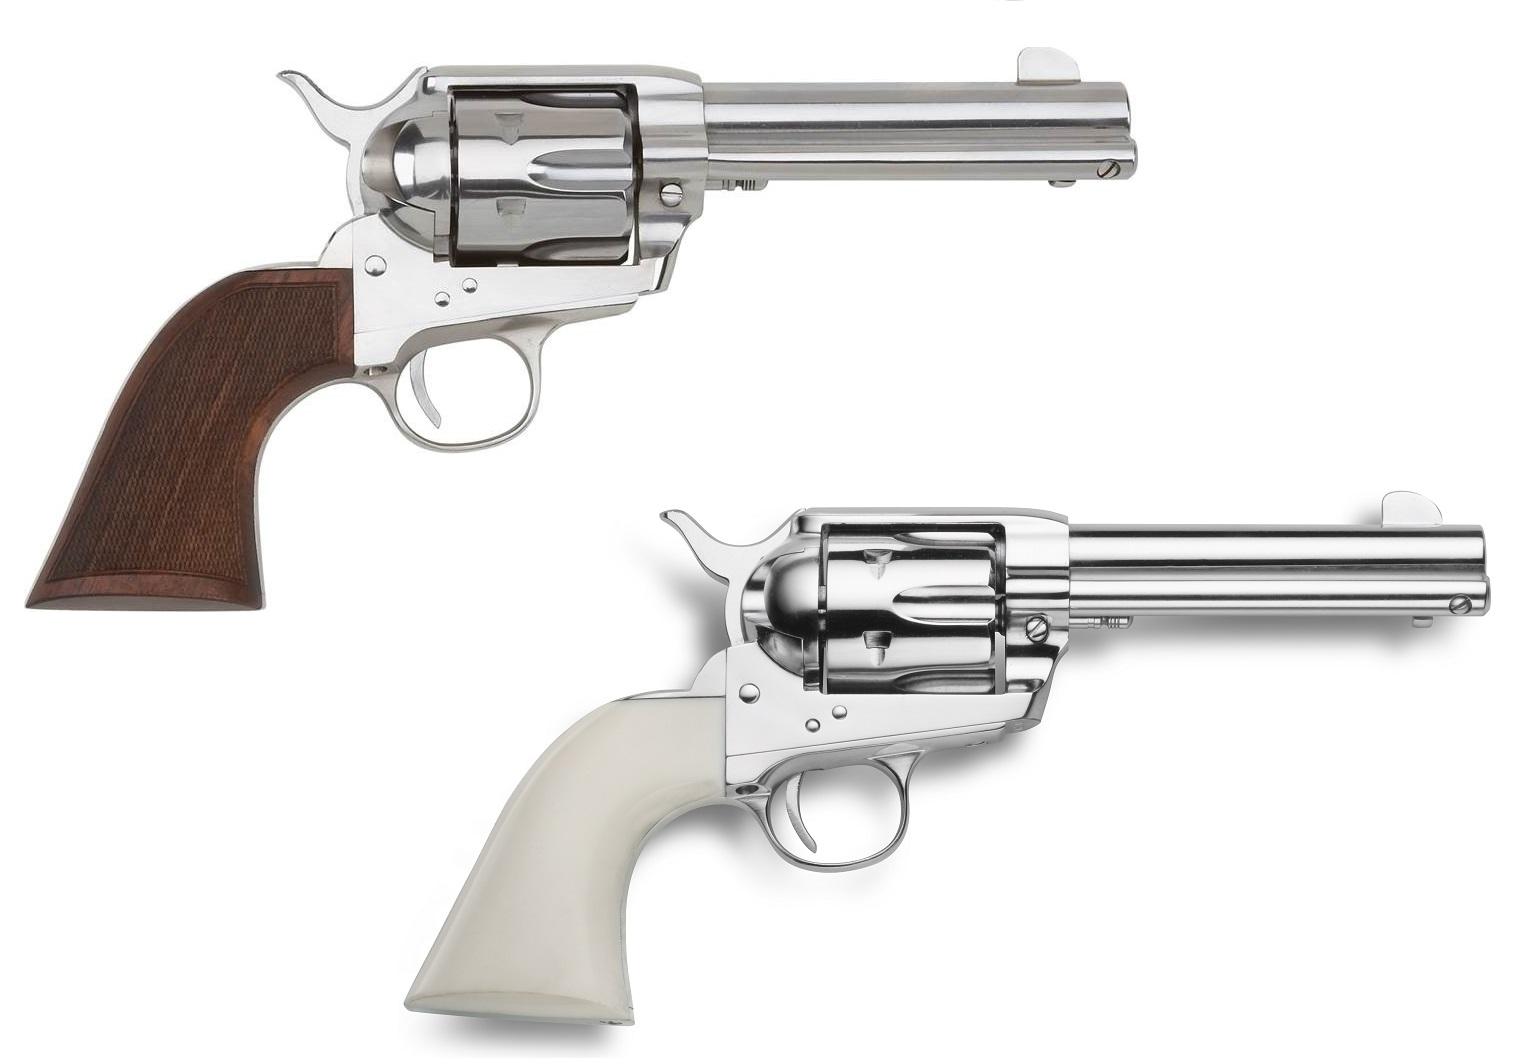 1873 Great Western II Revolvers - EMF Company